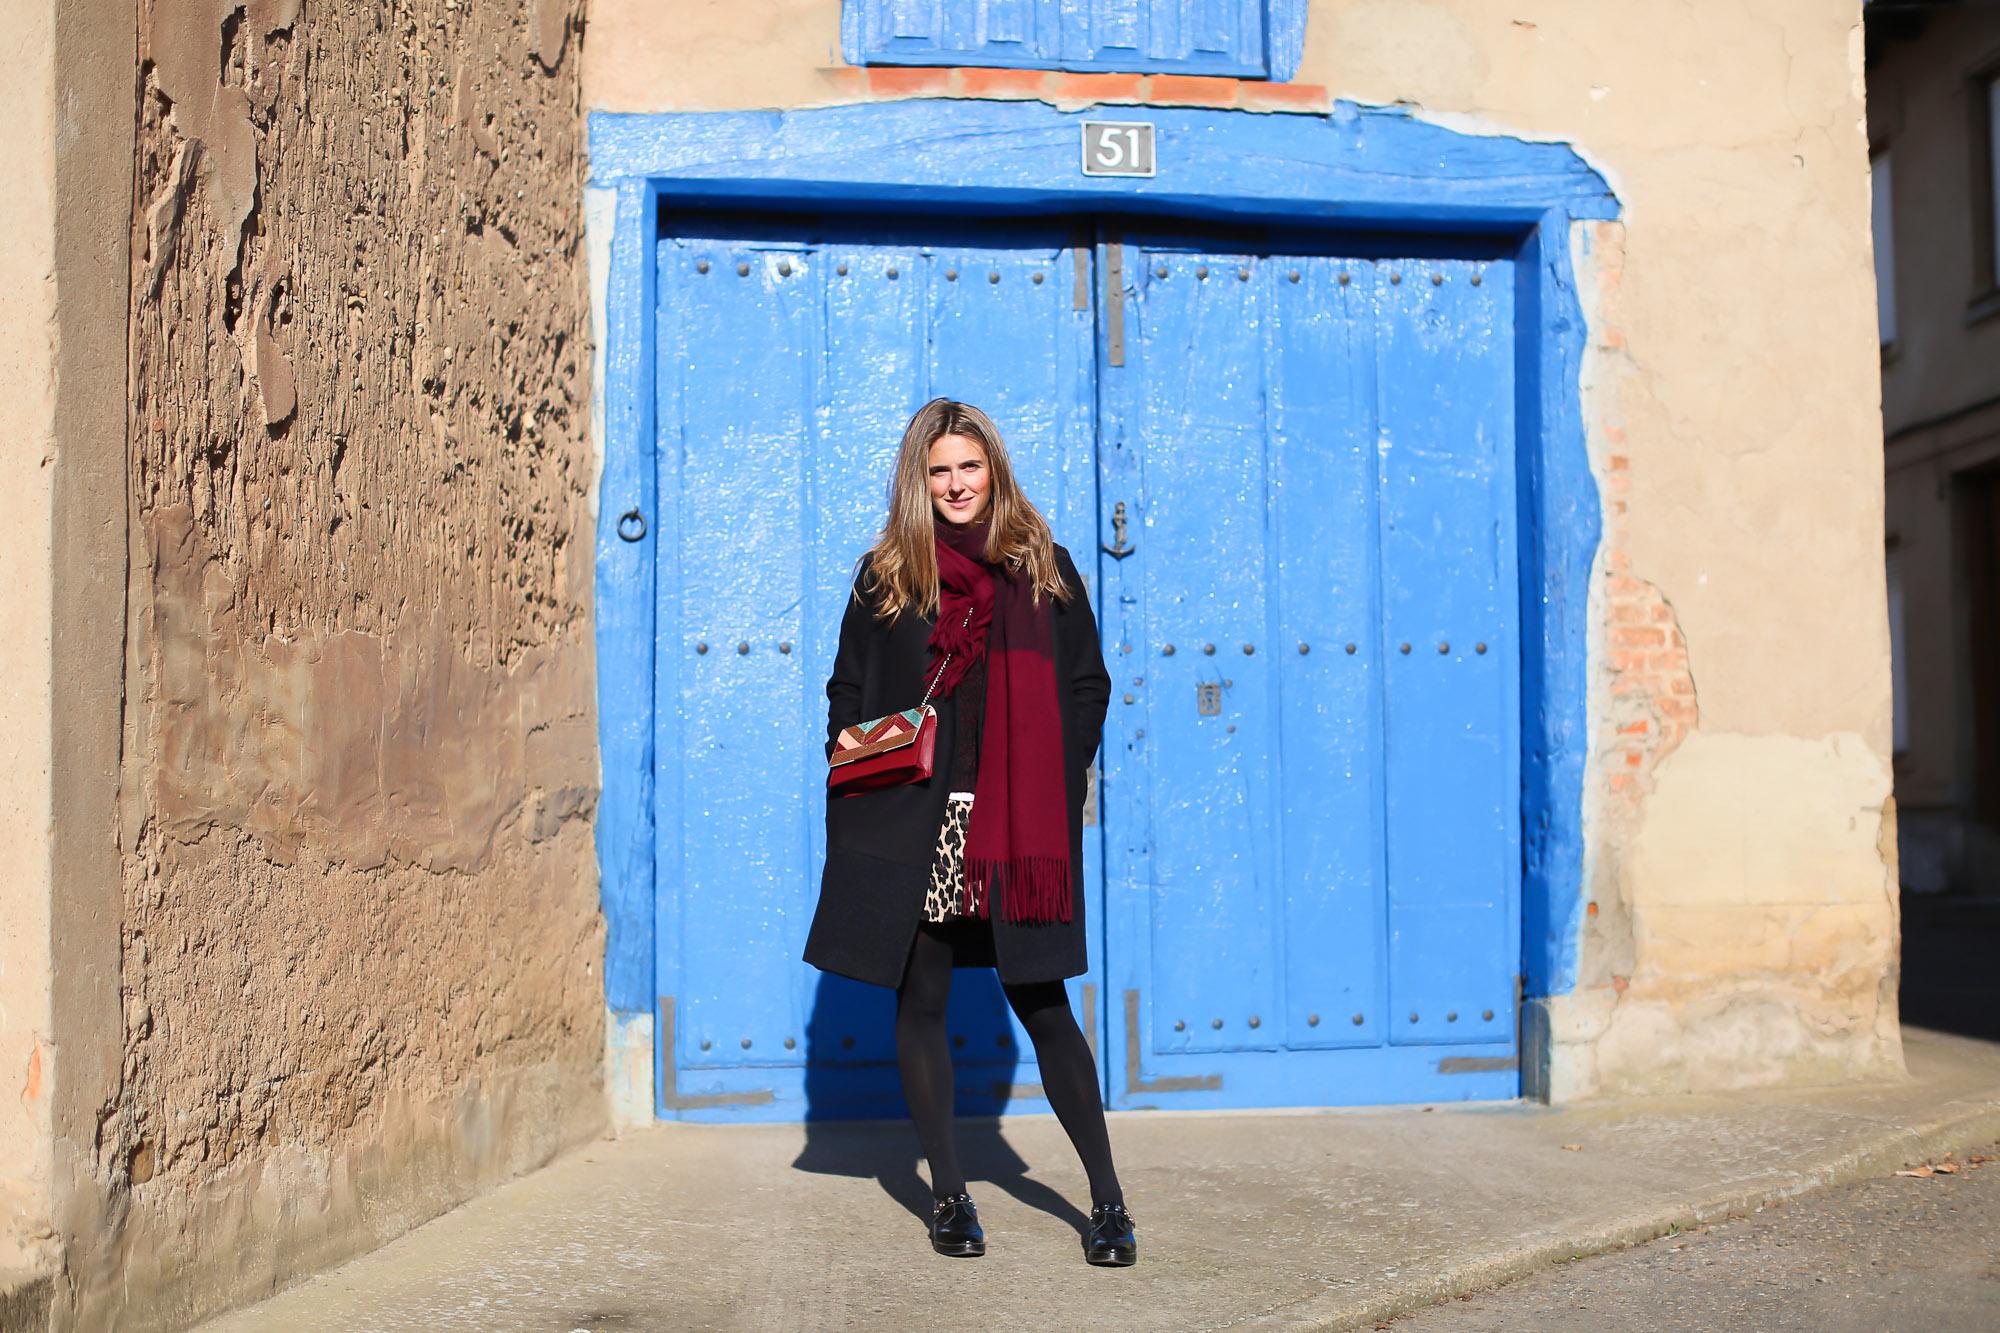 Clochet_streetstyle_fashionblogger_IKKSwoolknit_titamadridspigagranate_sandrobrogues_zaraleopardshorts